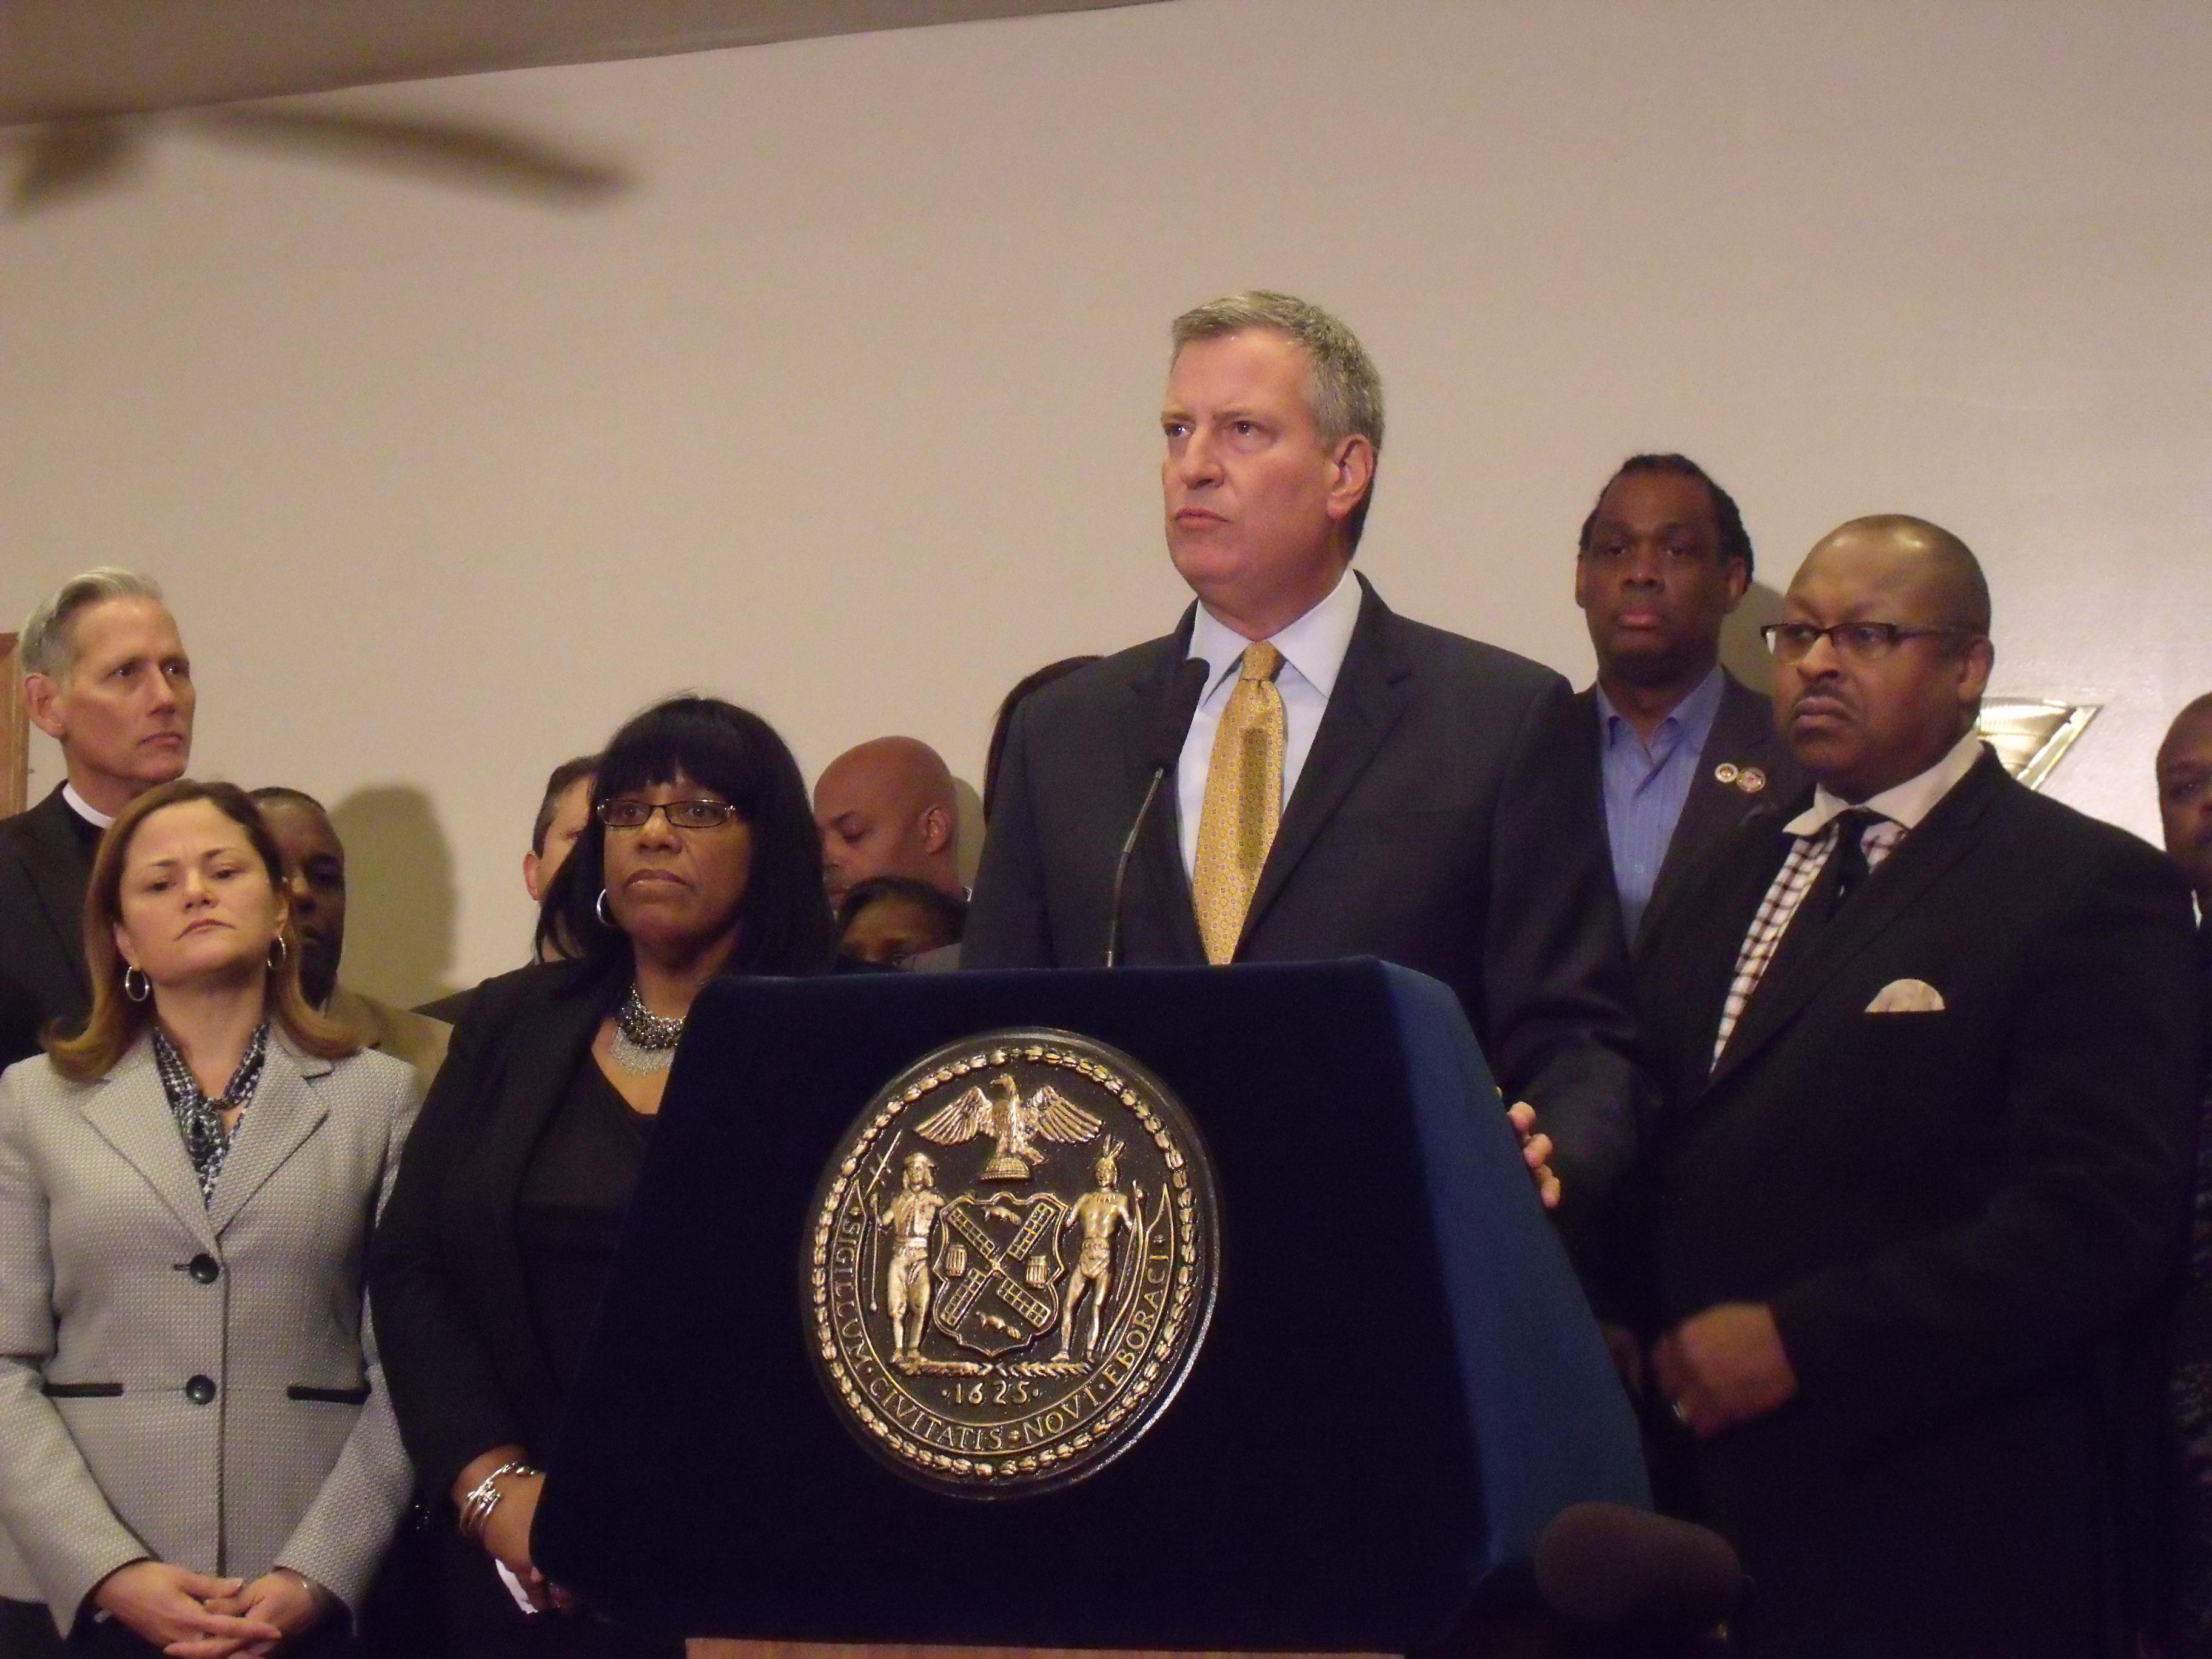 Mayor Bill de Blasio spoke tonight on Staten Island about the Eric Garner case. (Photo: Jillian Jorgensen)